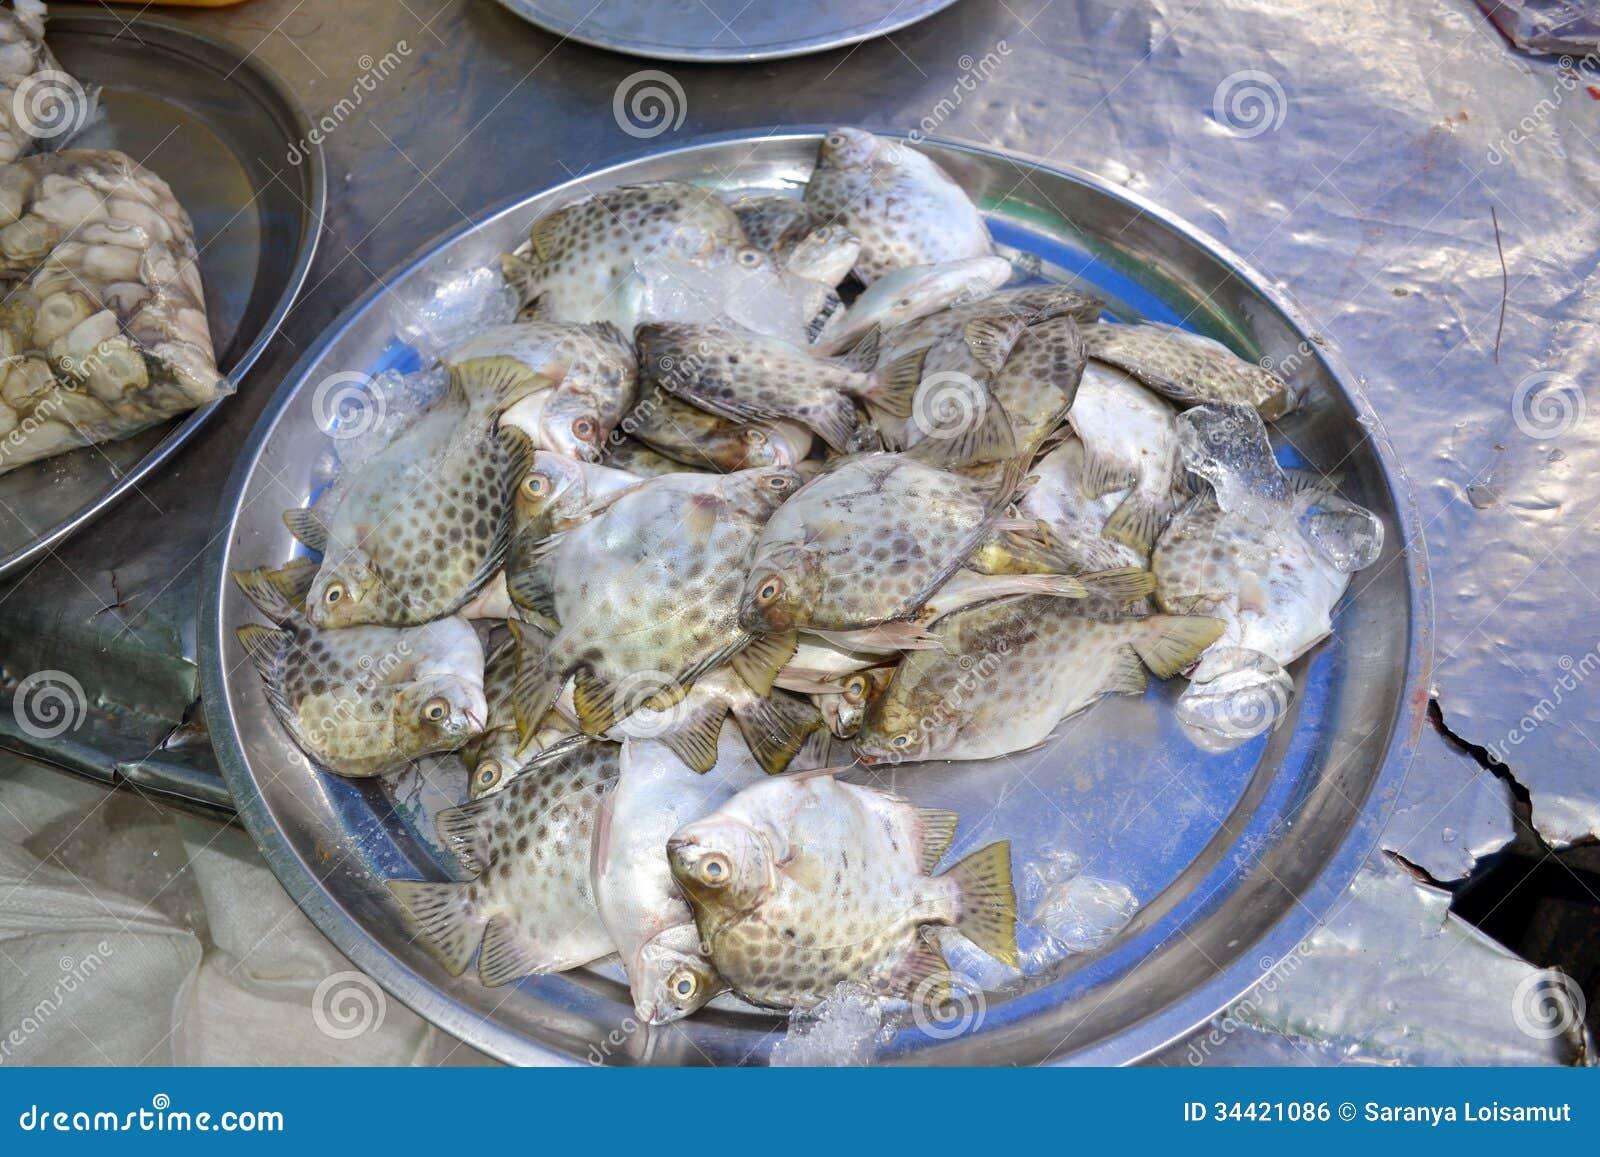 Fish royalty free stock image image 34421086 for Brackish water fish